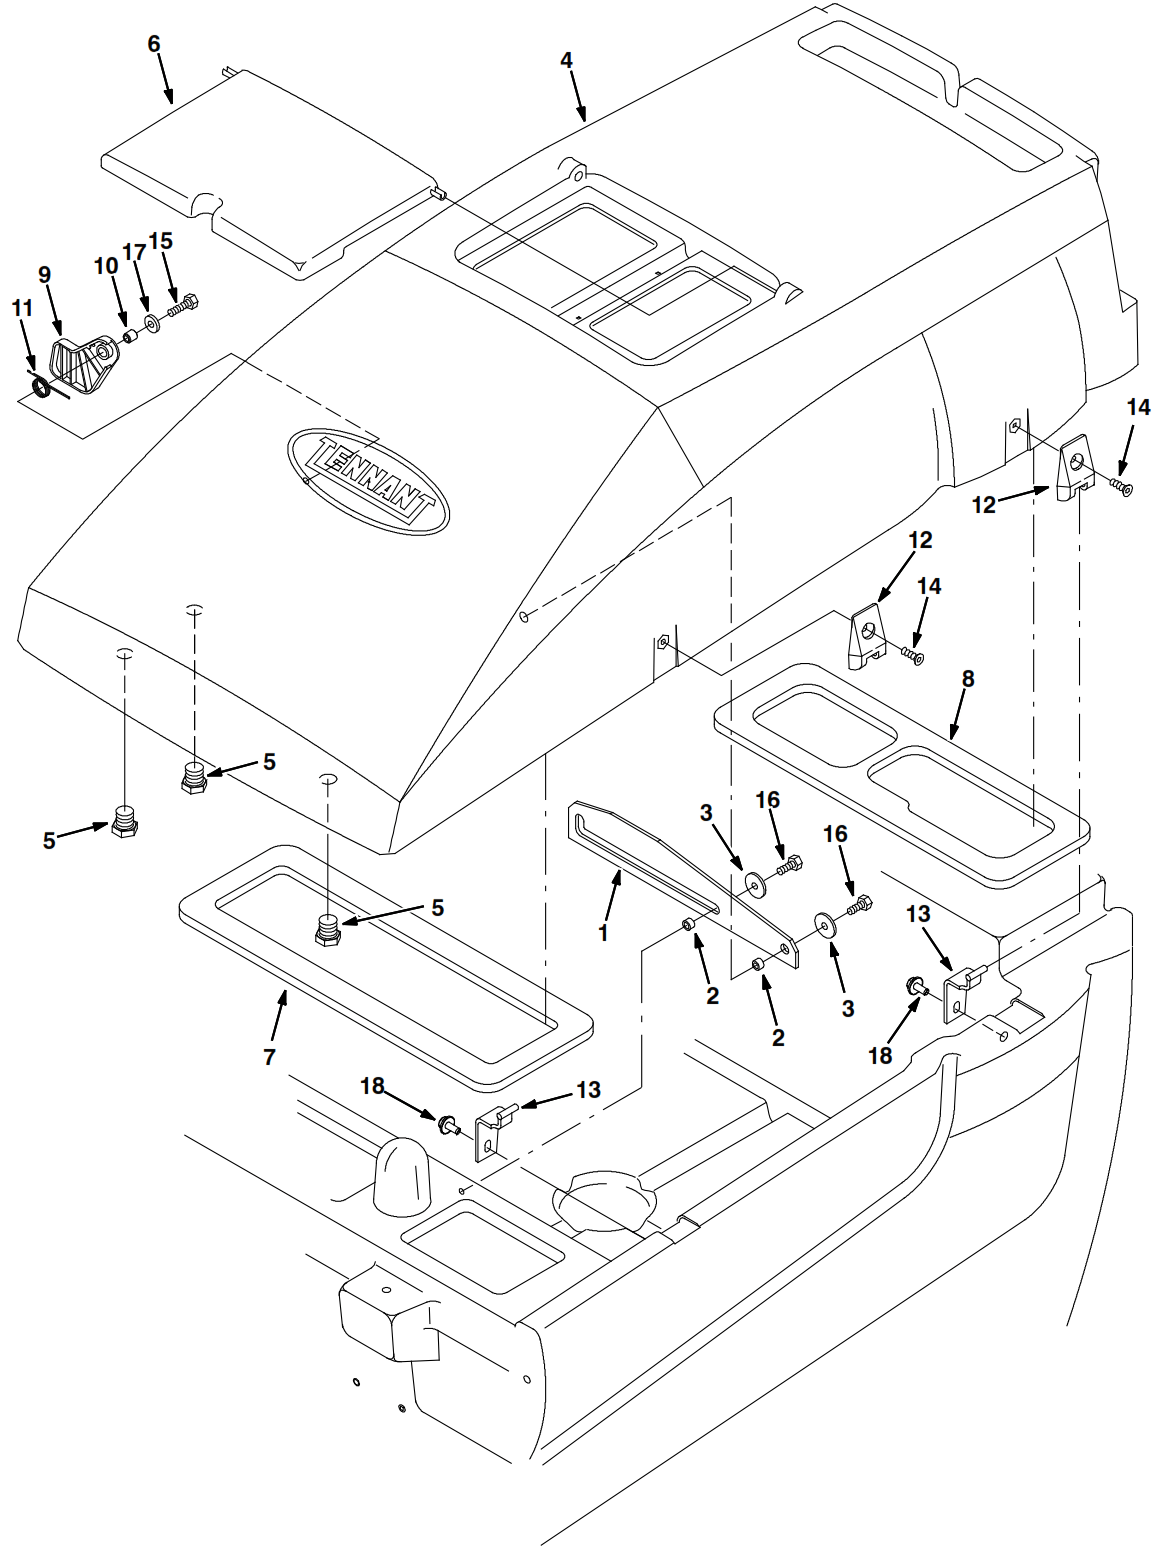 Tennant Parts And Diagram